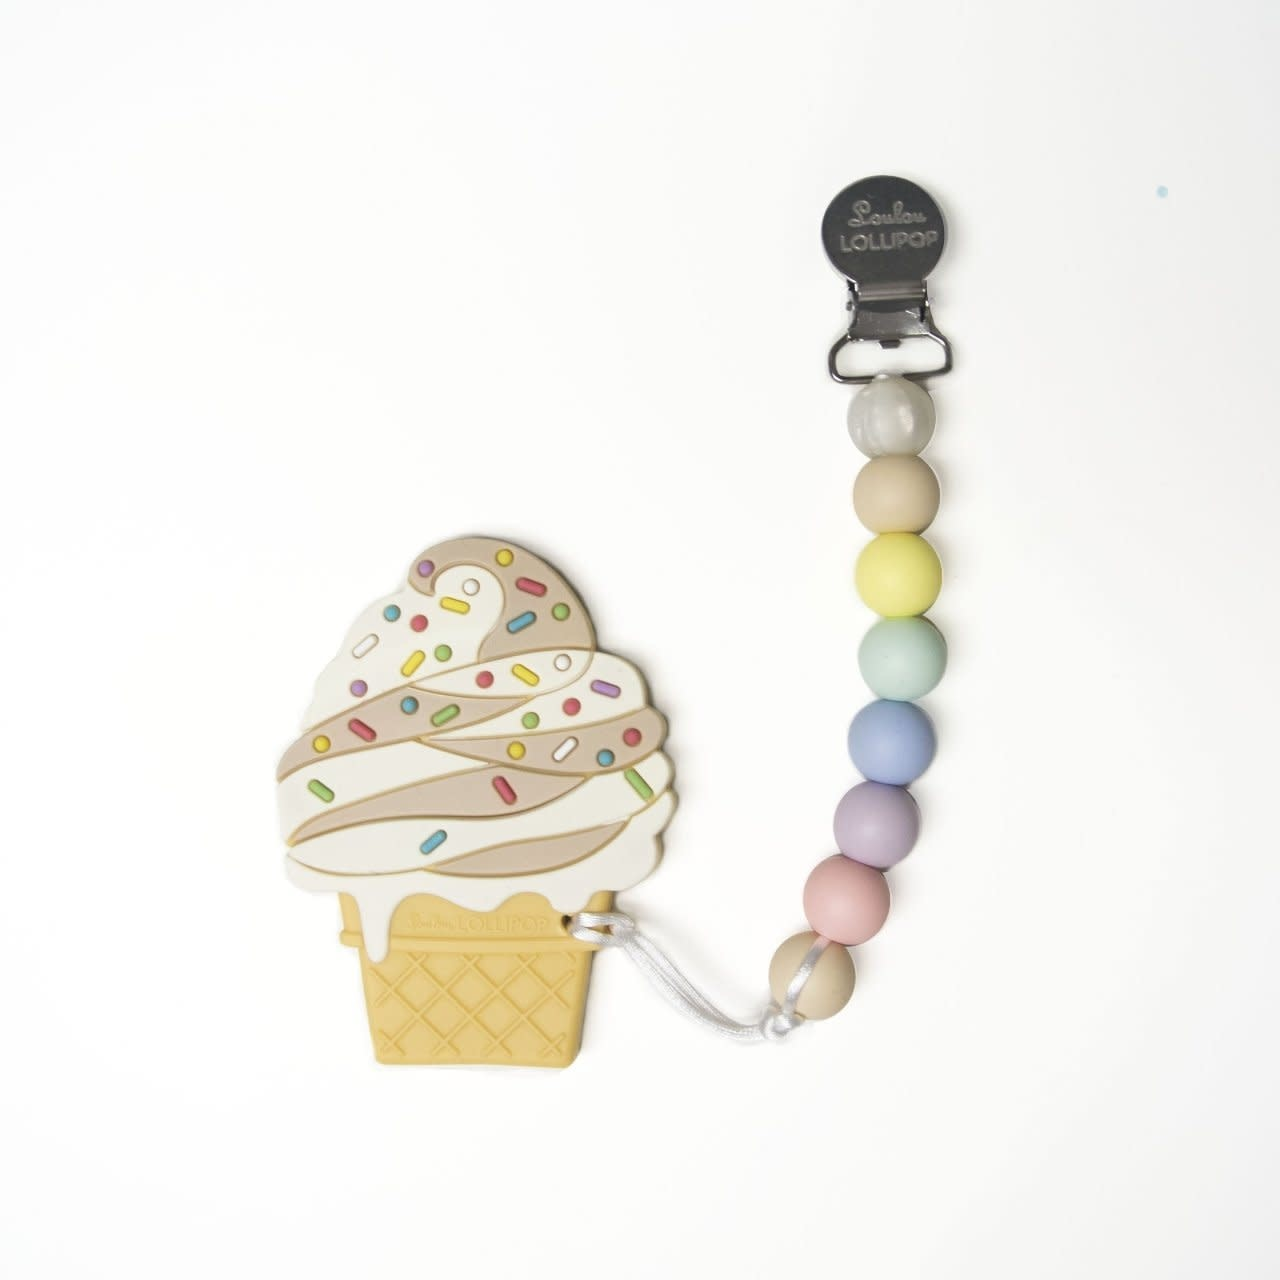 Lou Lou Lollipop Chocolate Ice Cream Teether Set